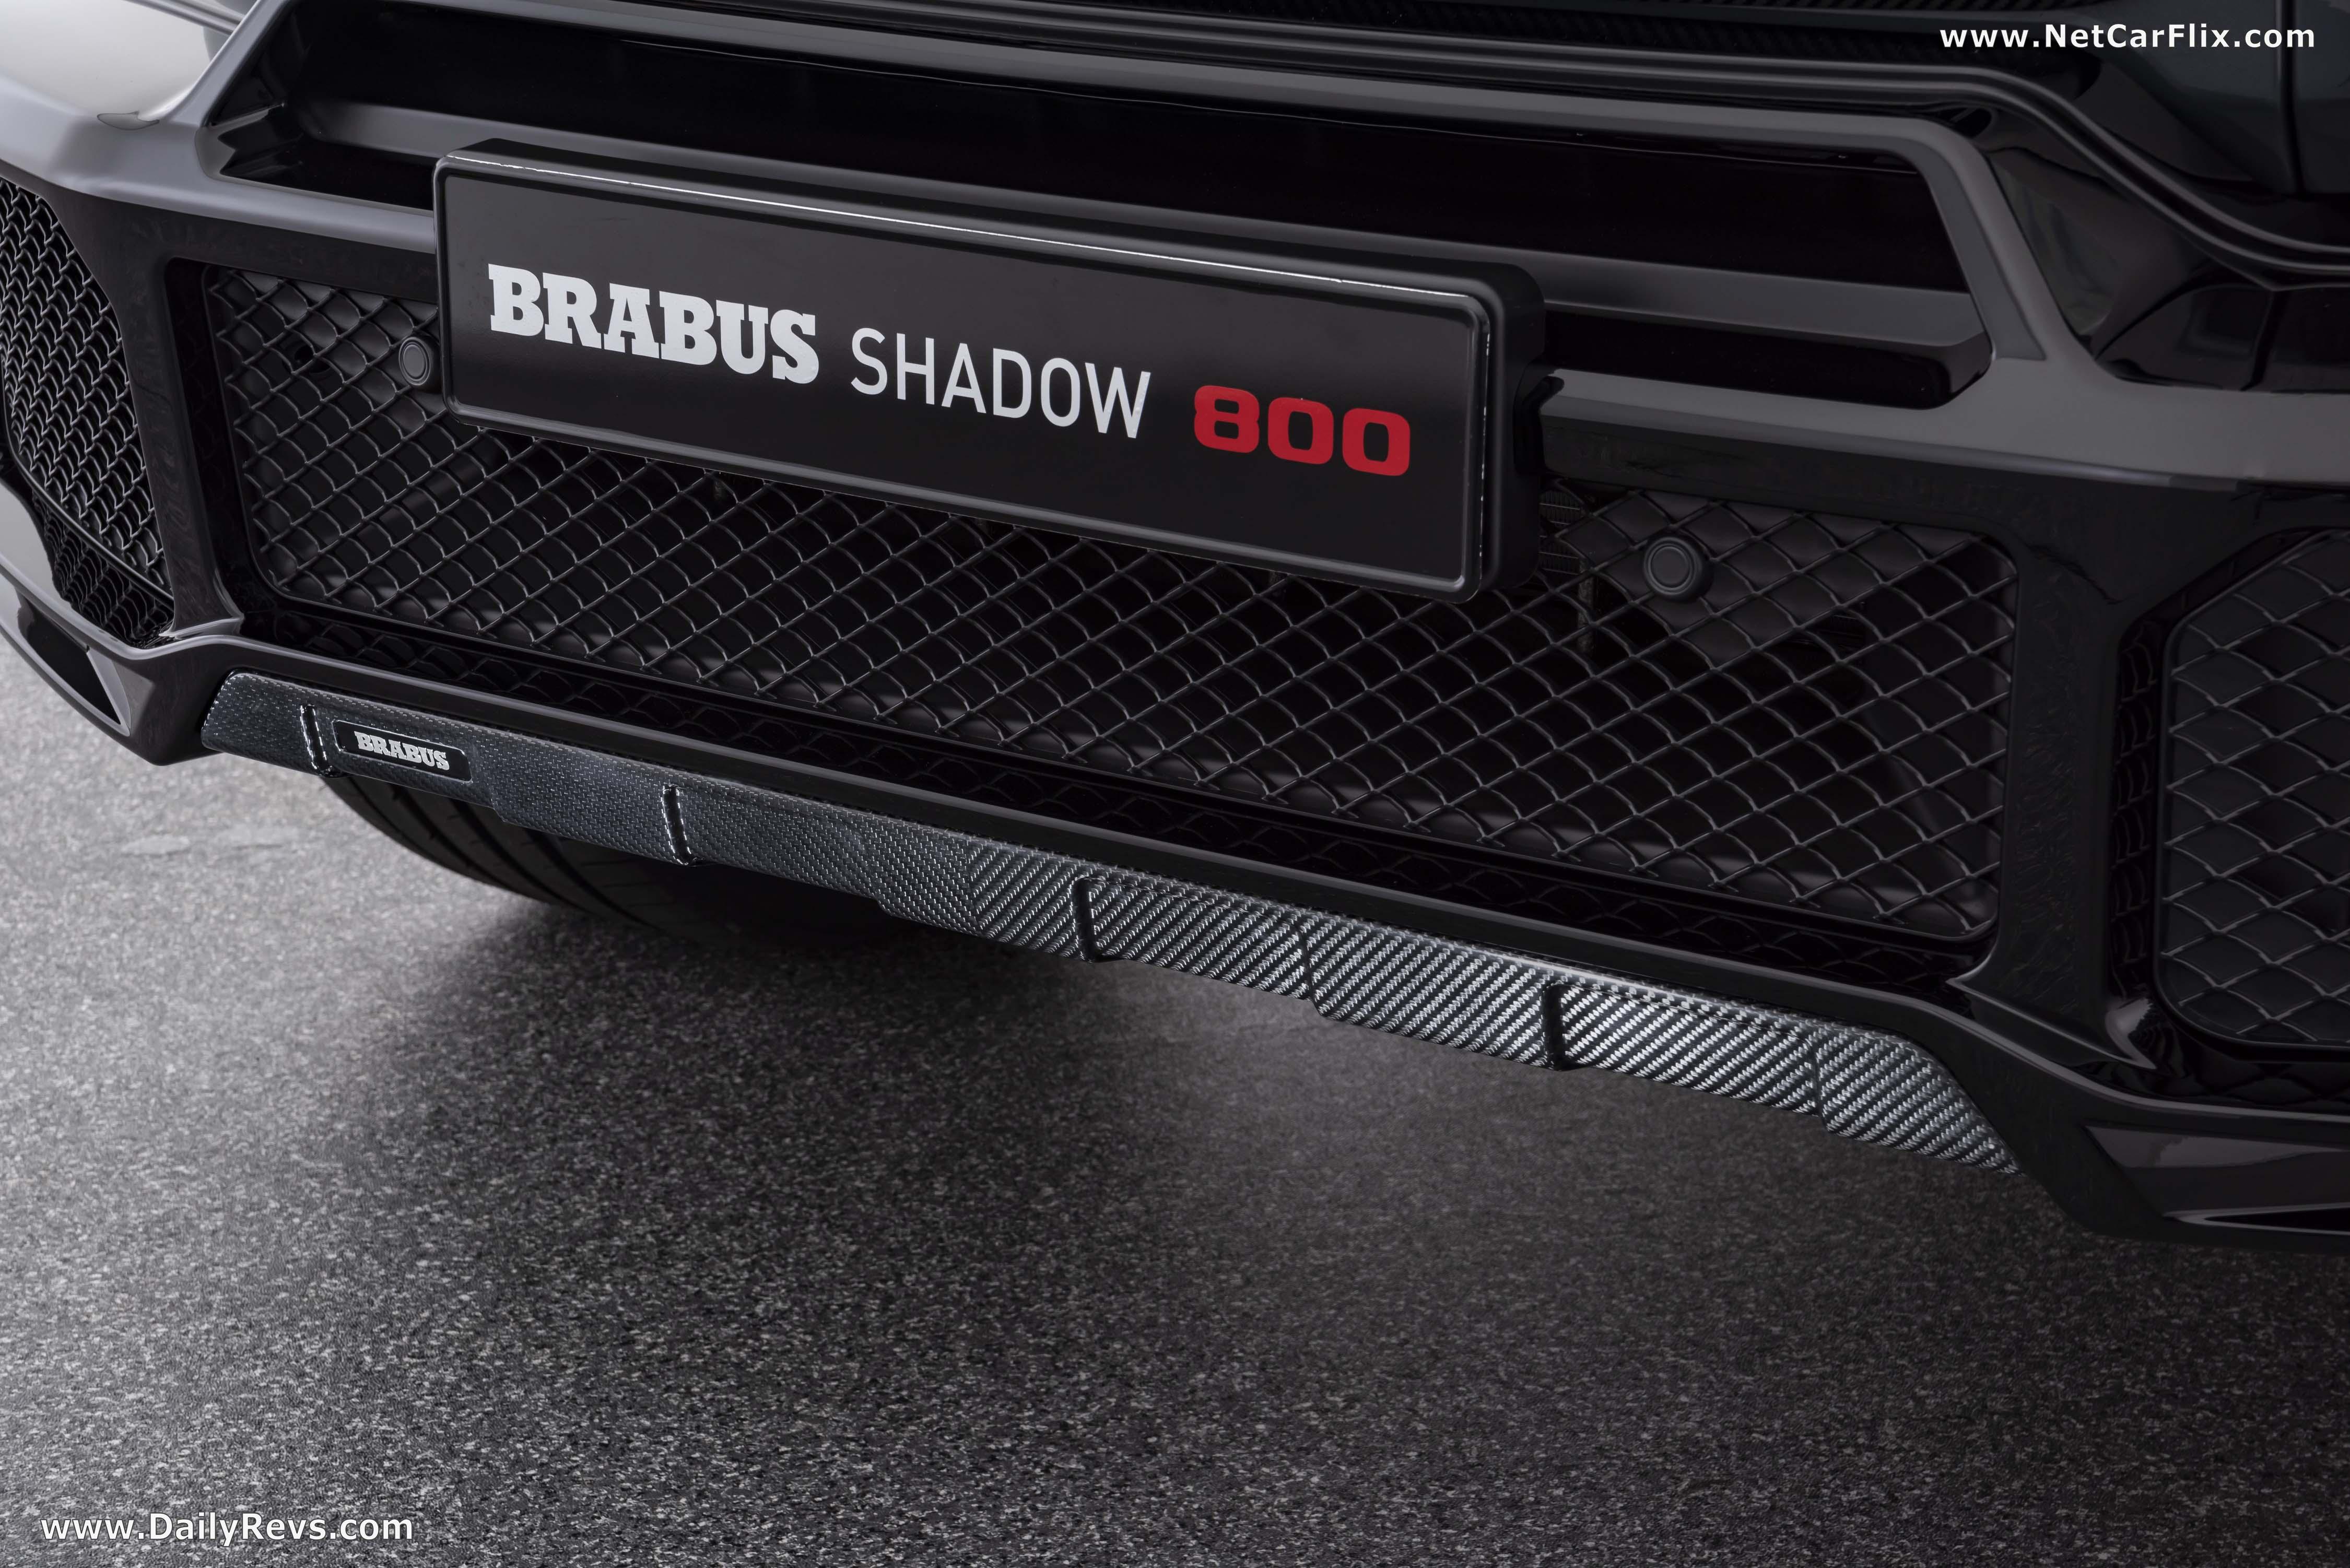 2019 Brabus Shadow 800 full